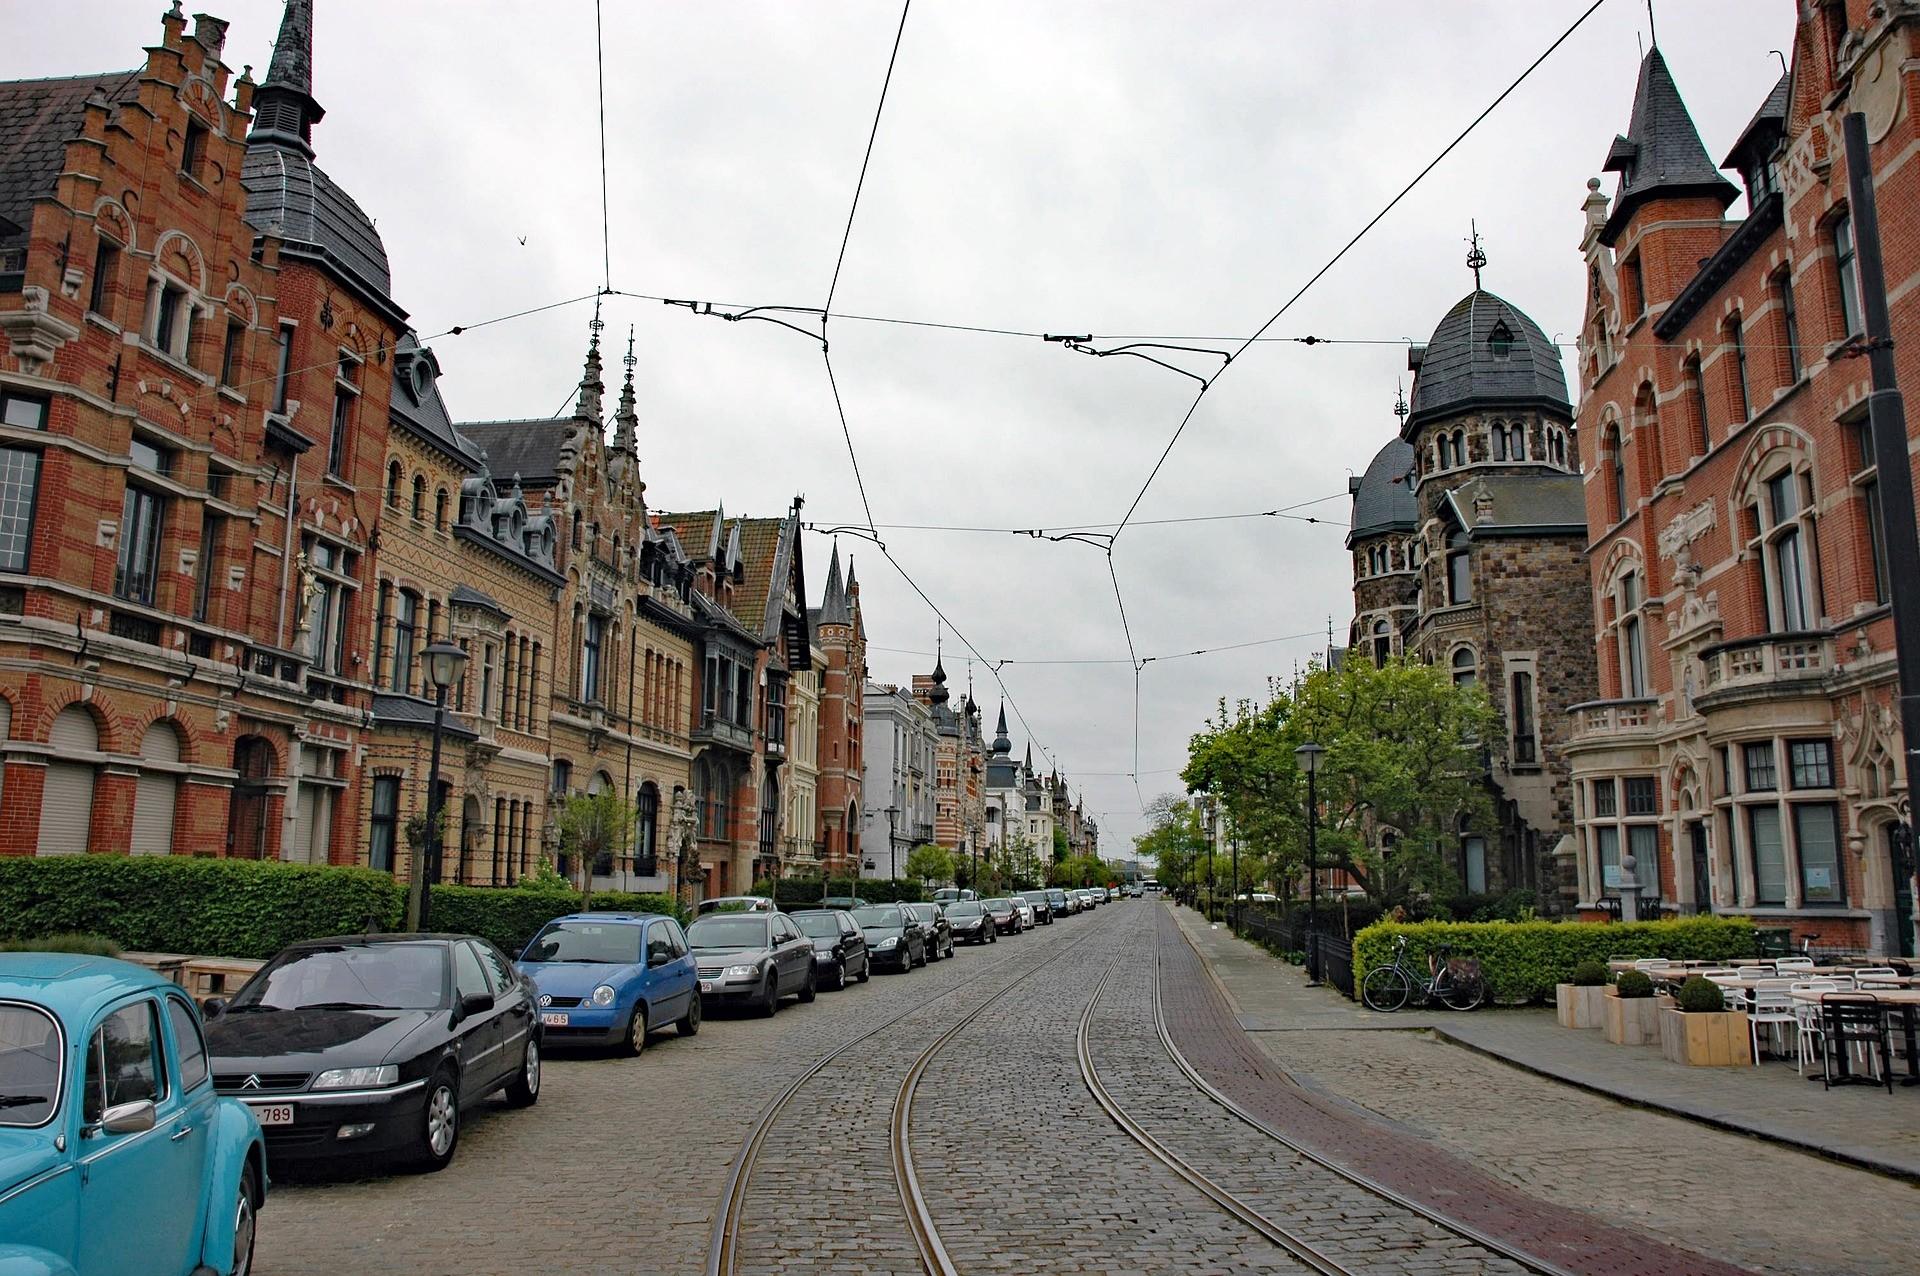 Strada di Anversa - Foto di Commander05